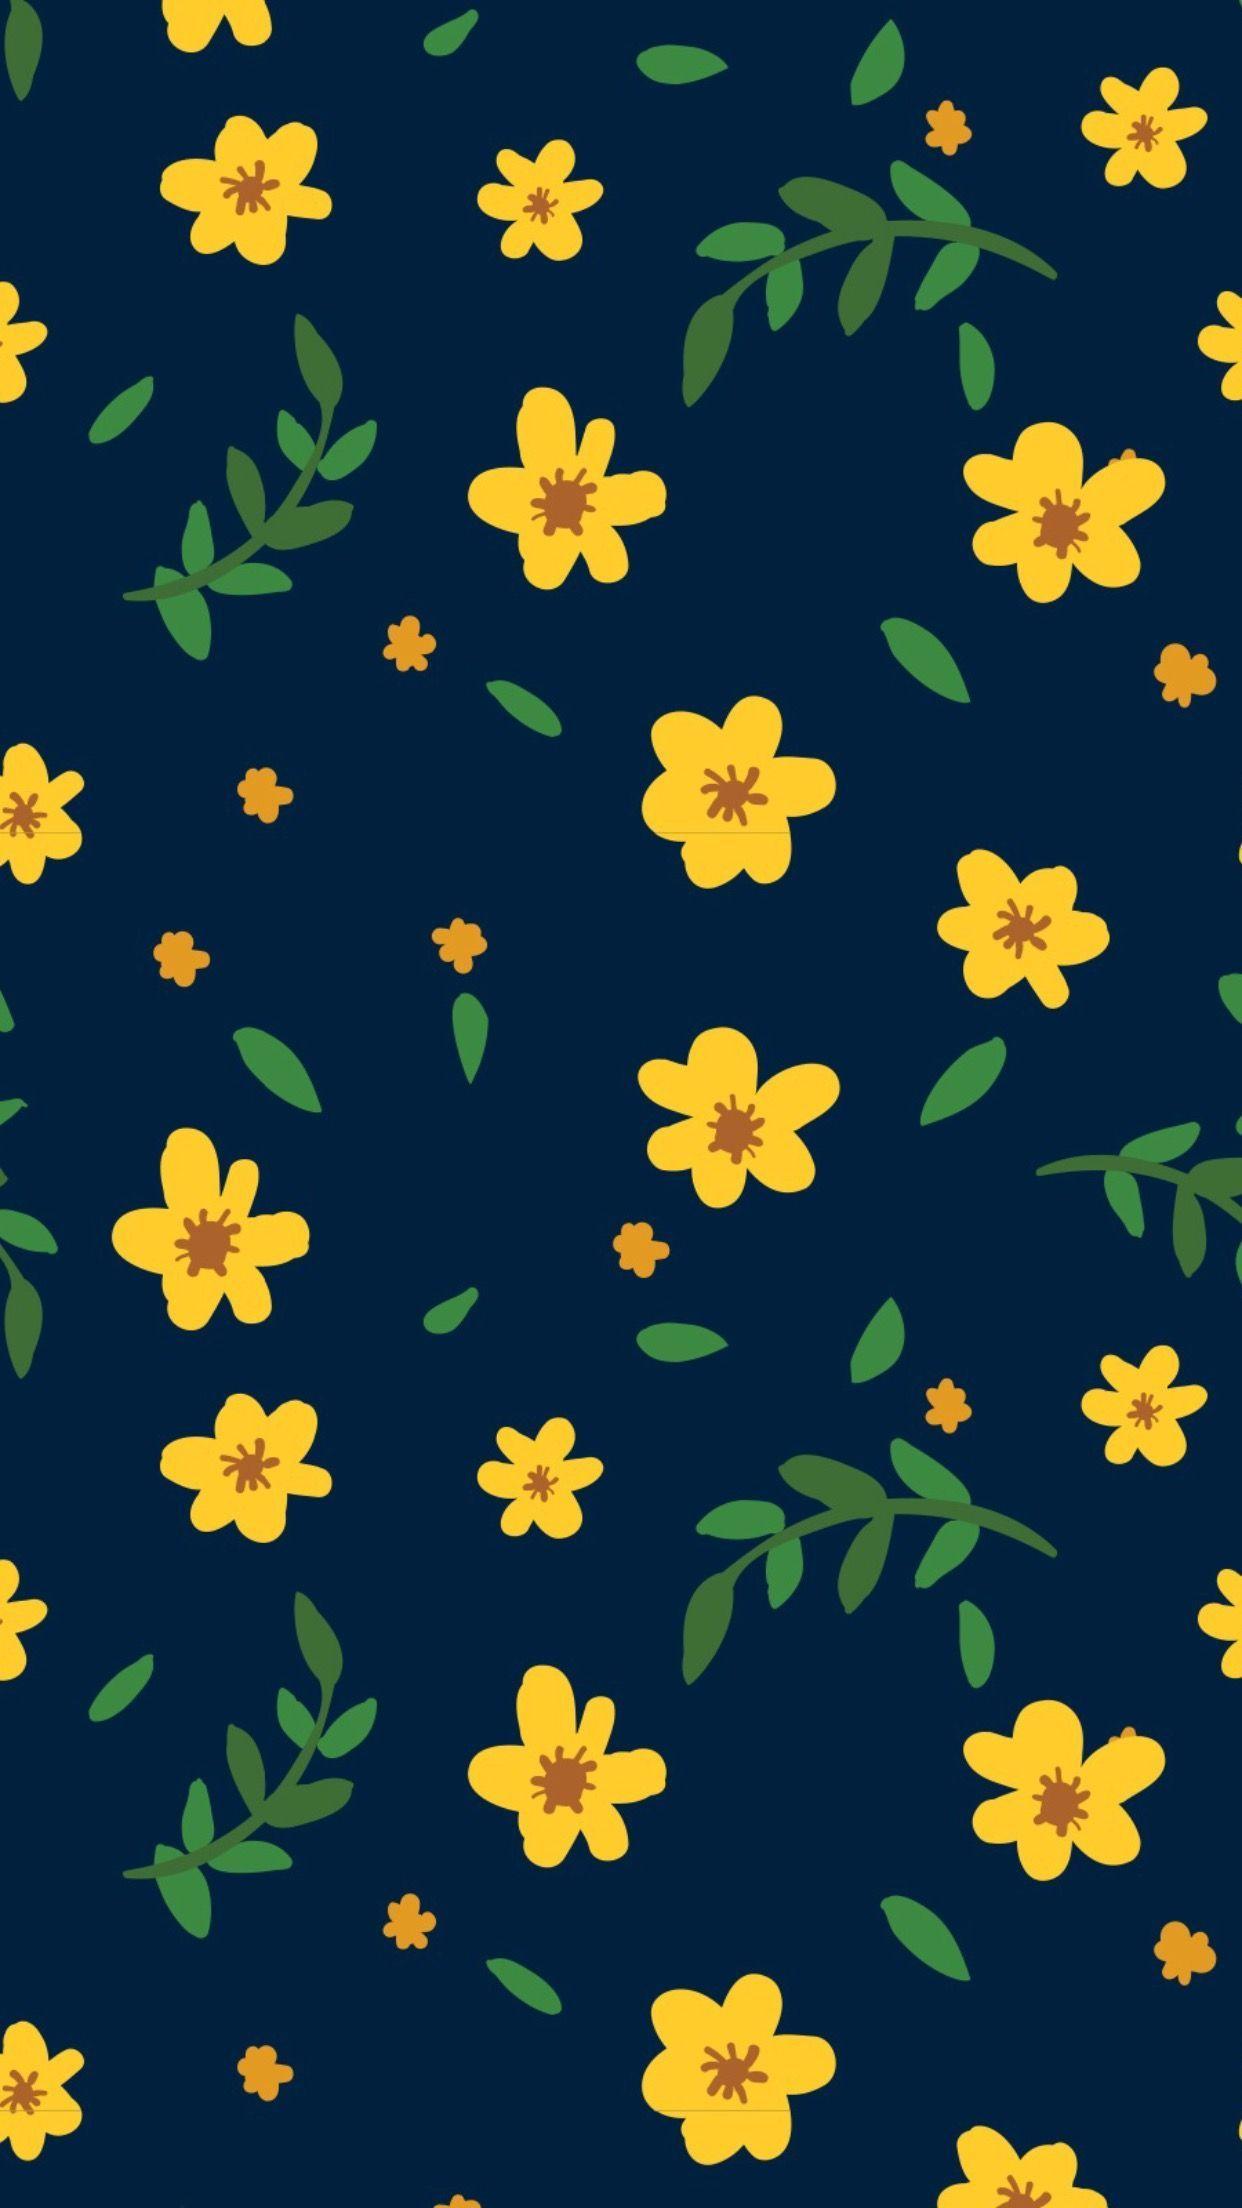 Wallpaper Pinterest Patriciamaroca Flower Wallpaper Spring Wallpaper Blue Wallpaper Iphone